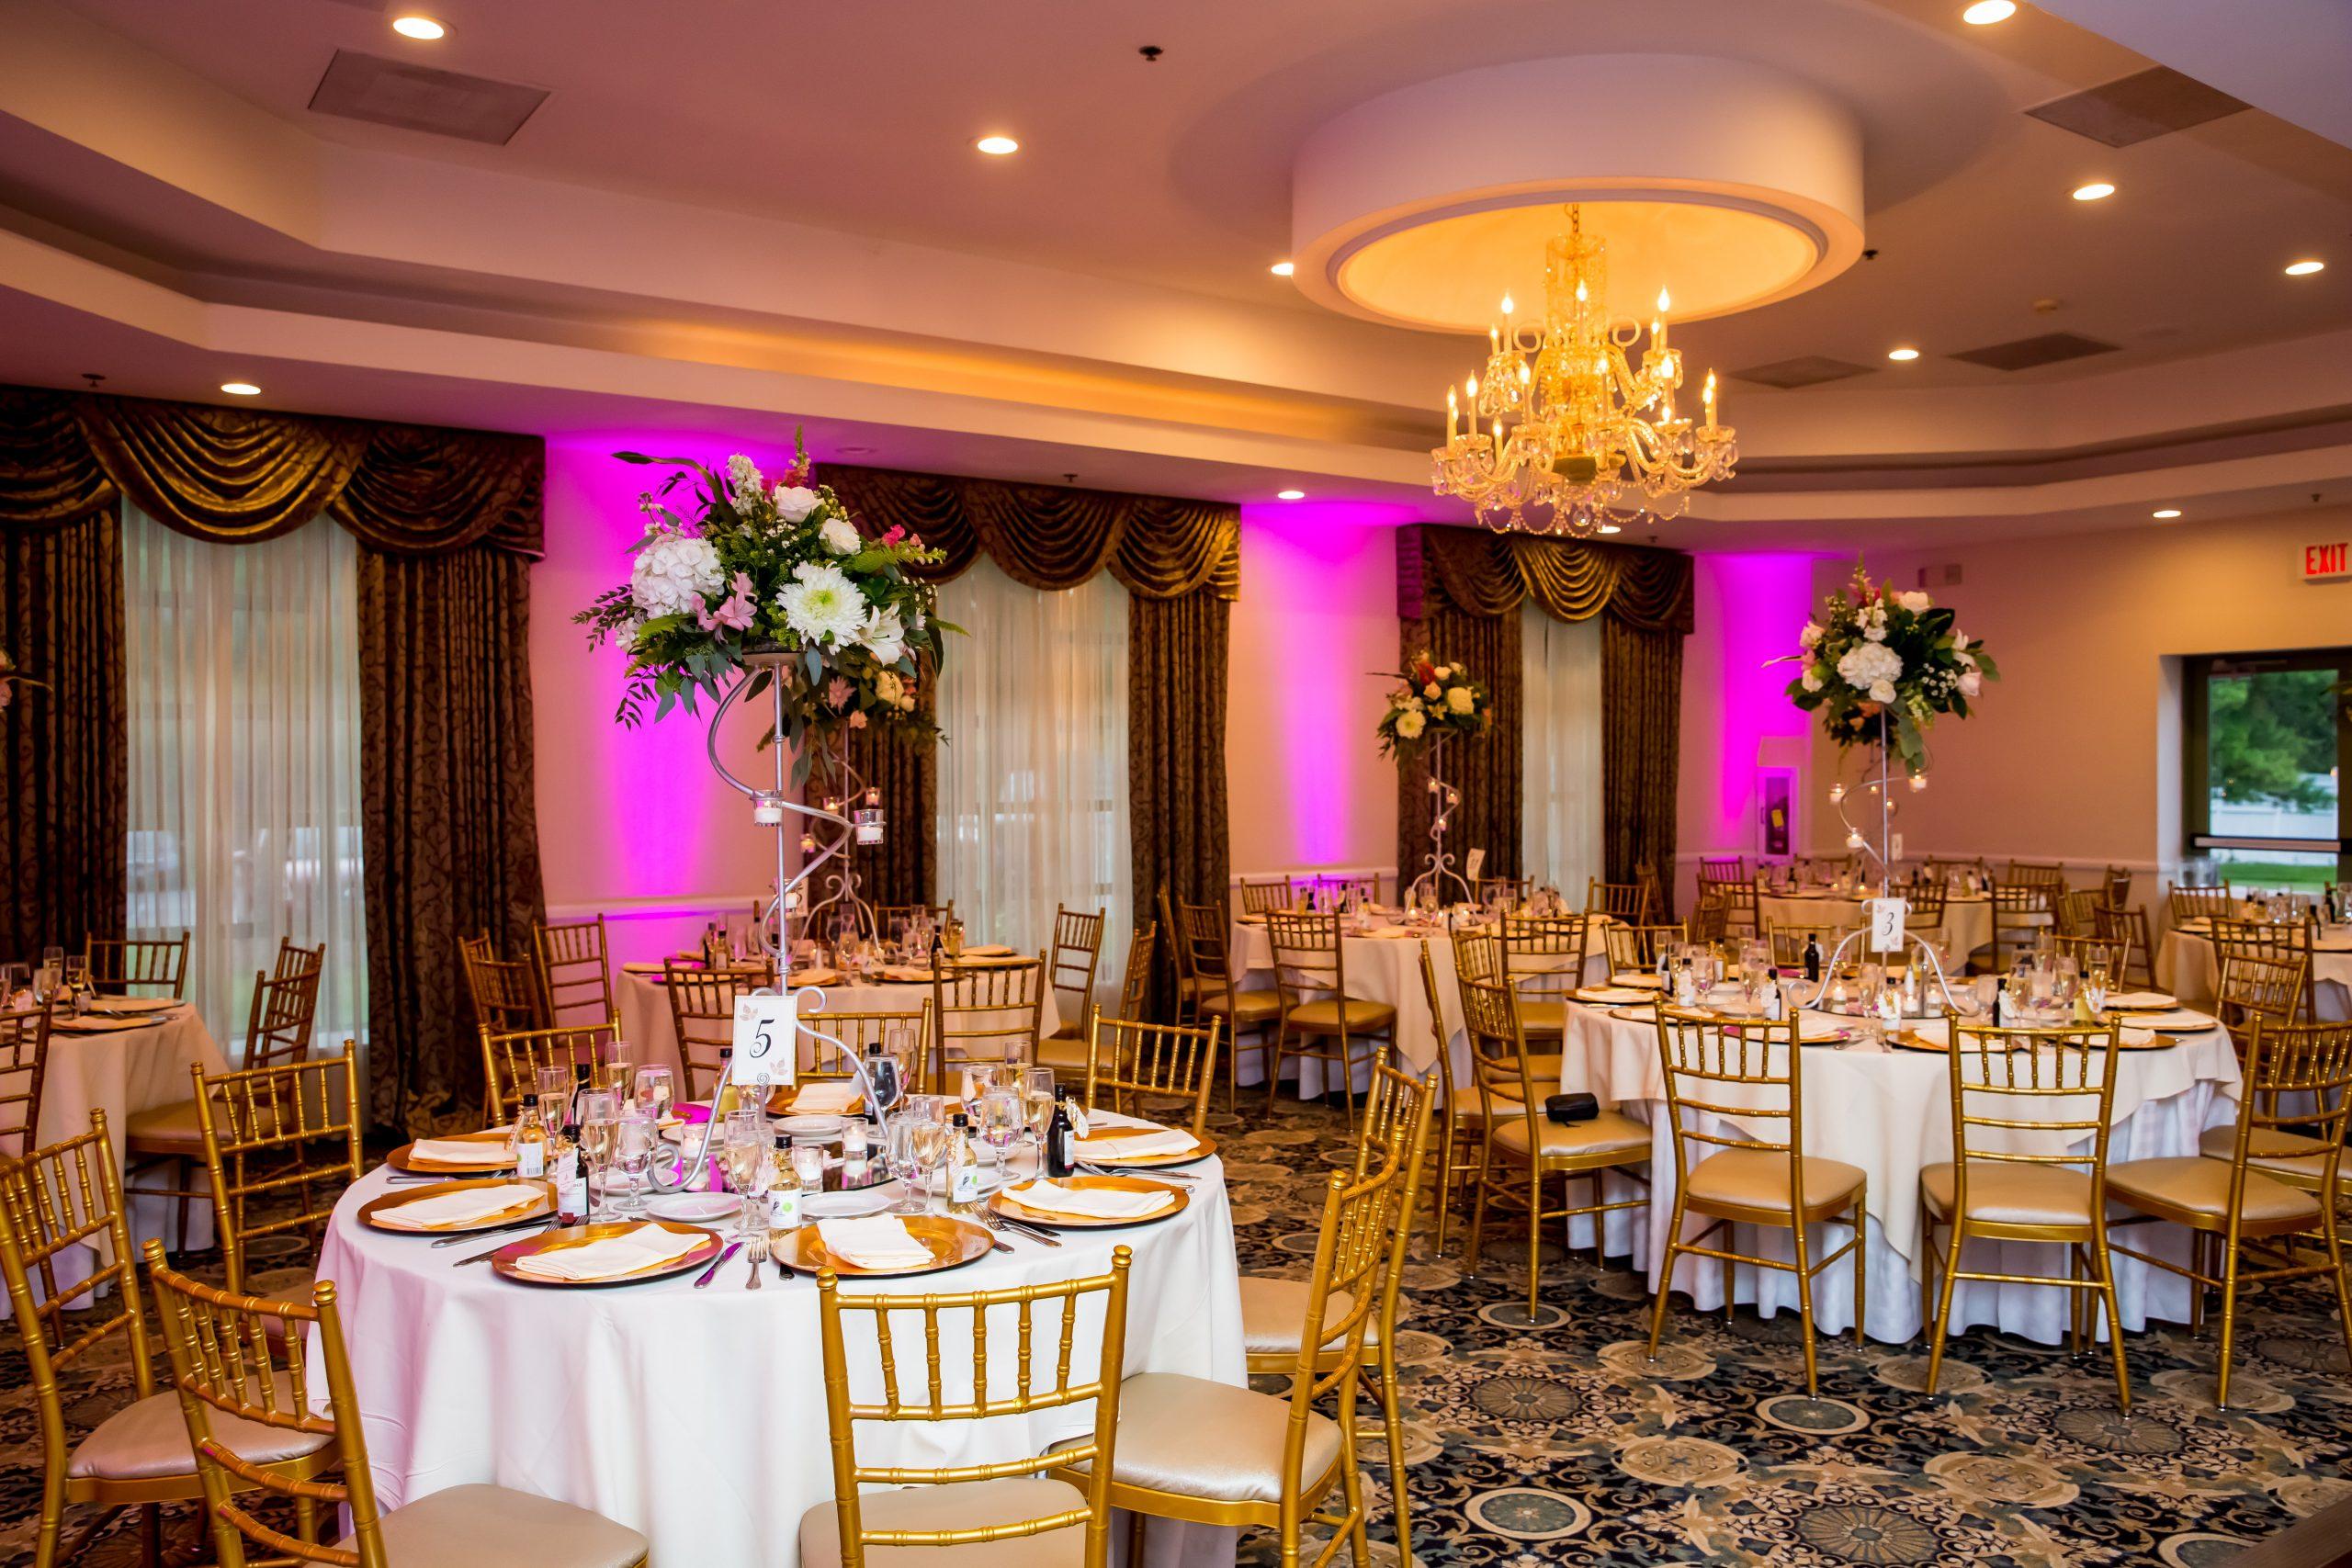 Victori_Rob_Mohawk River Country Club Wedding-48.jpg